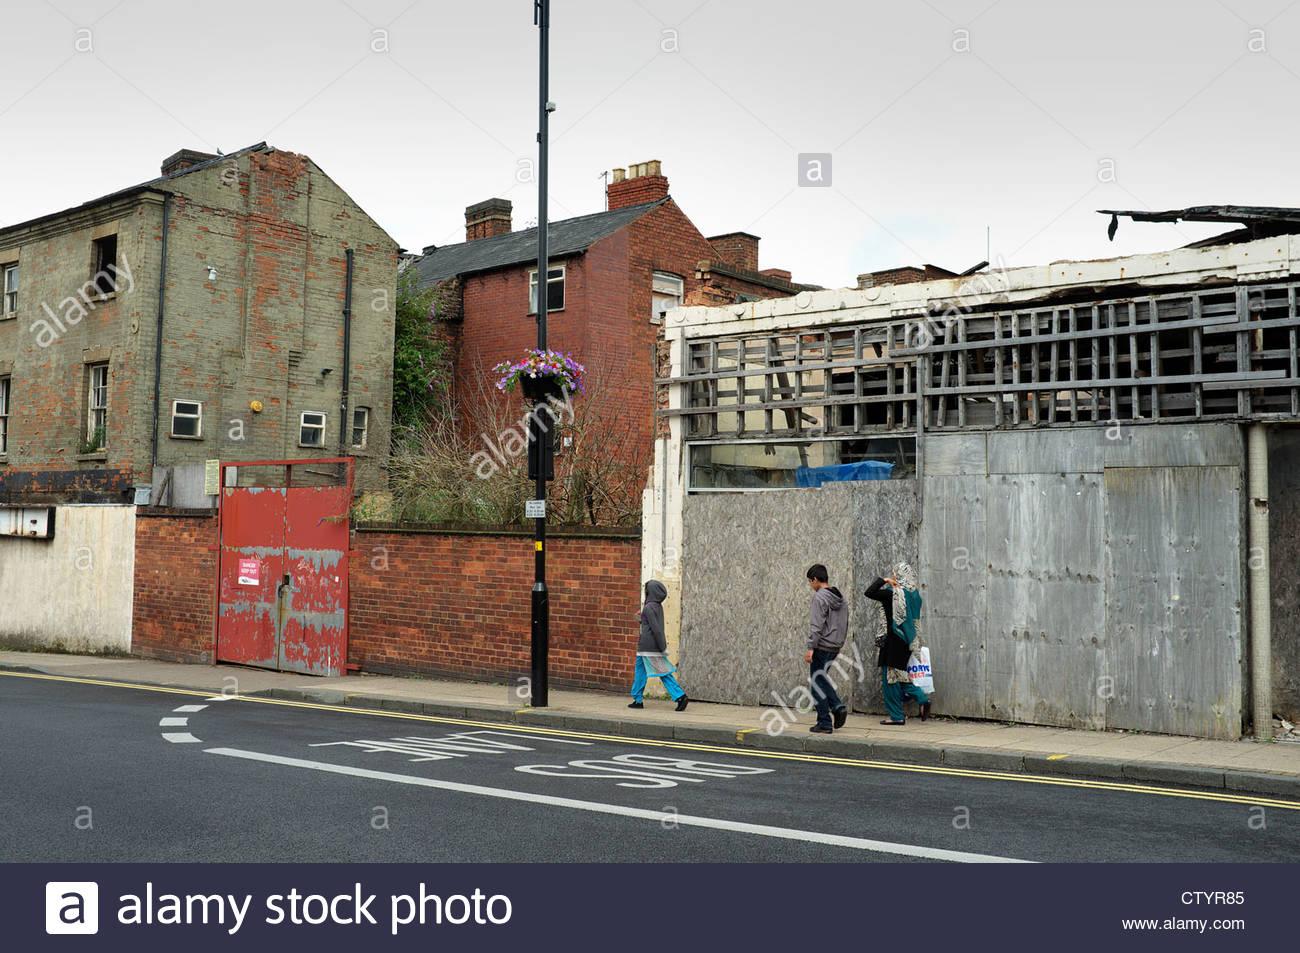 rundown-area-of-inner-city-wolverhampton-cleveland-street-uk-CTYR85.jpg